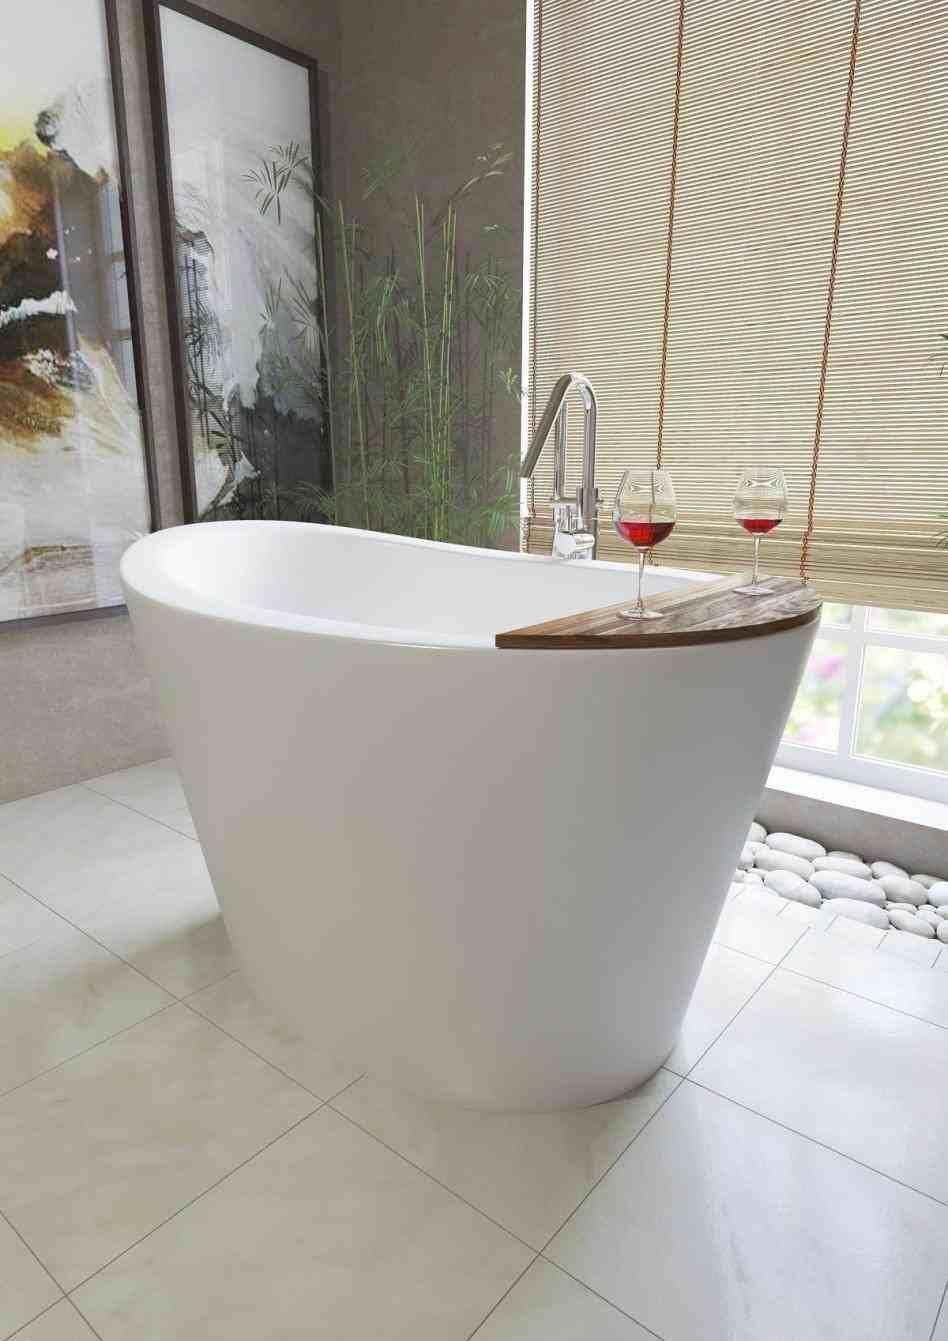 8 x 4 badezimmer designs new post soaking tubs for two visit bathroomremodelideassub